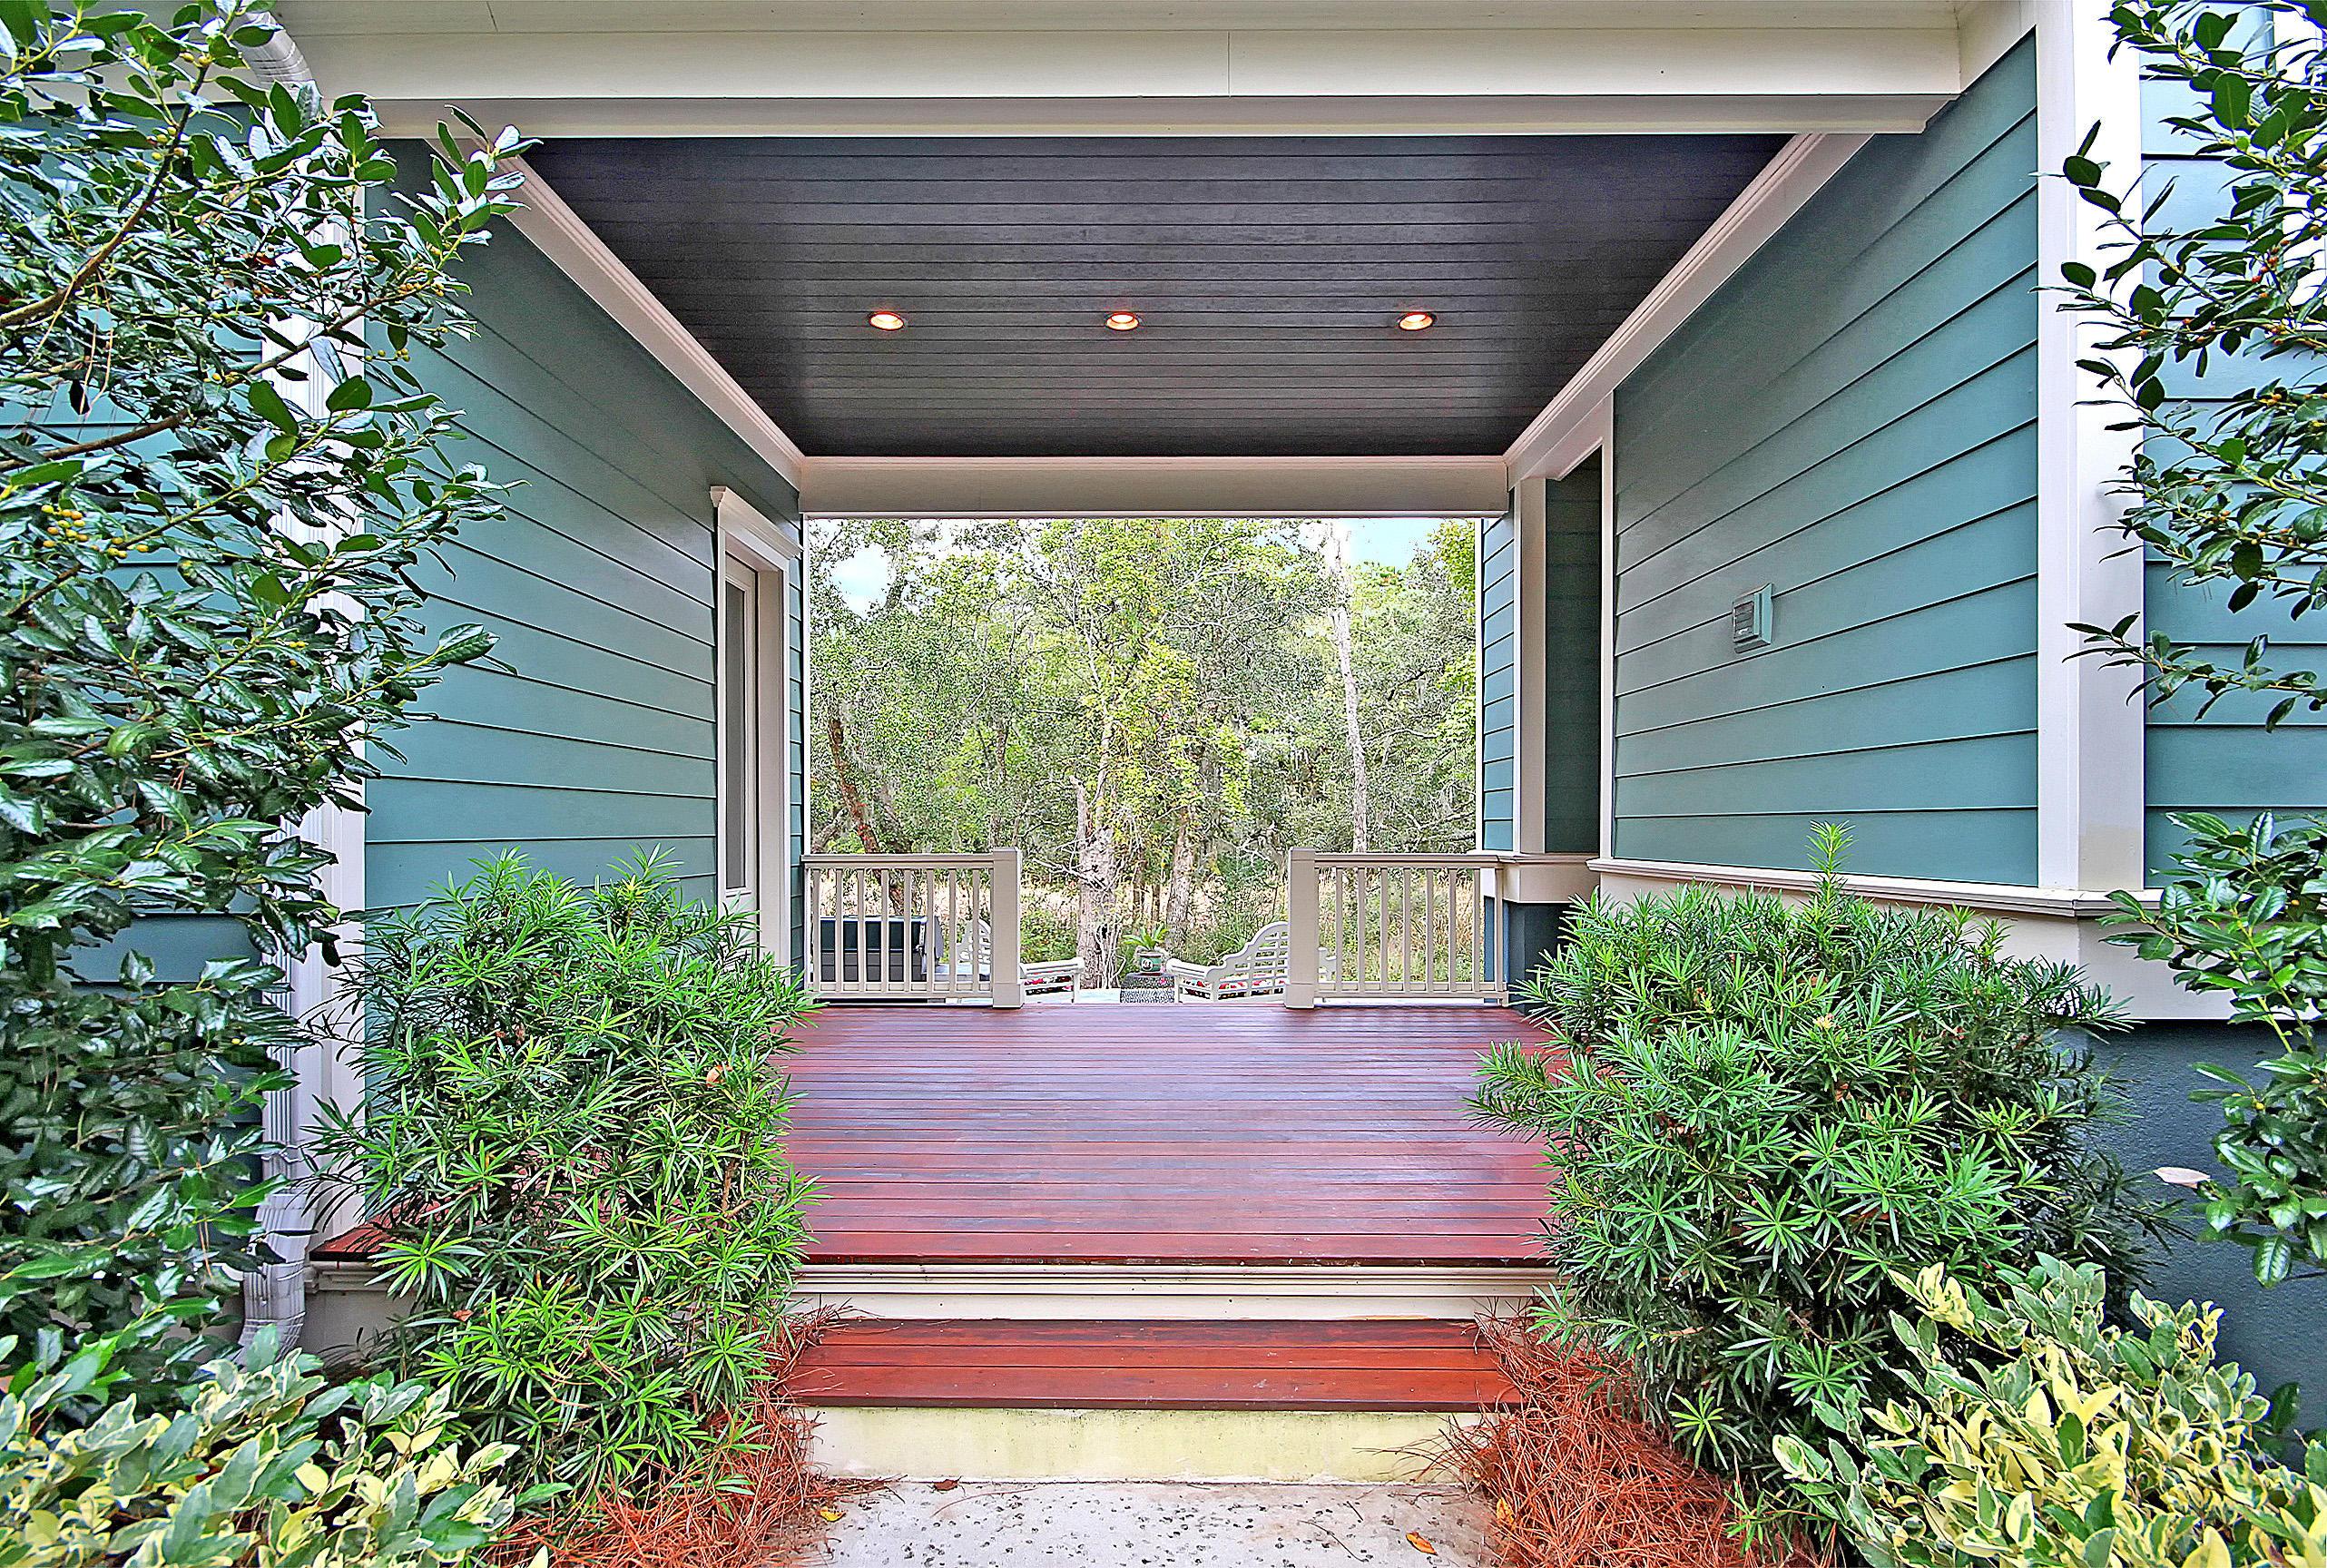 Daniel Island Homes For Sale - 1136 Oak Overhang, Daniel Island, SC - 32